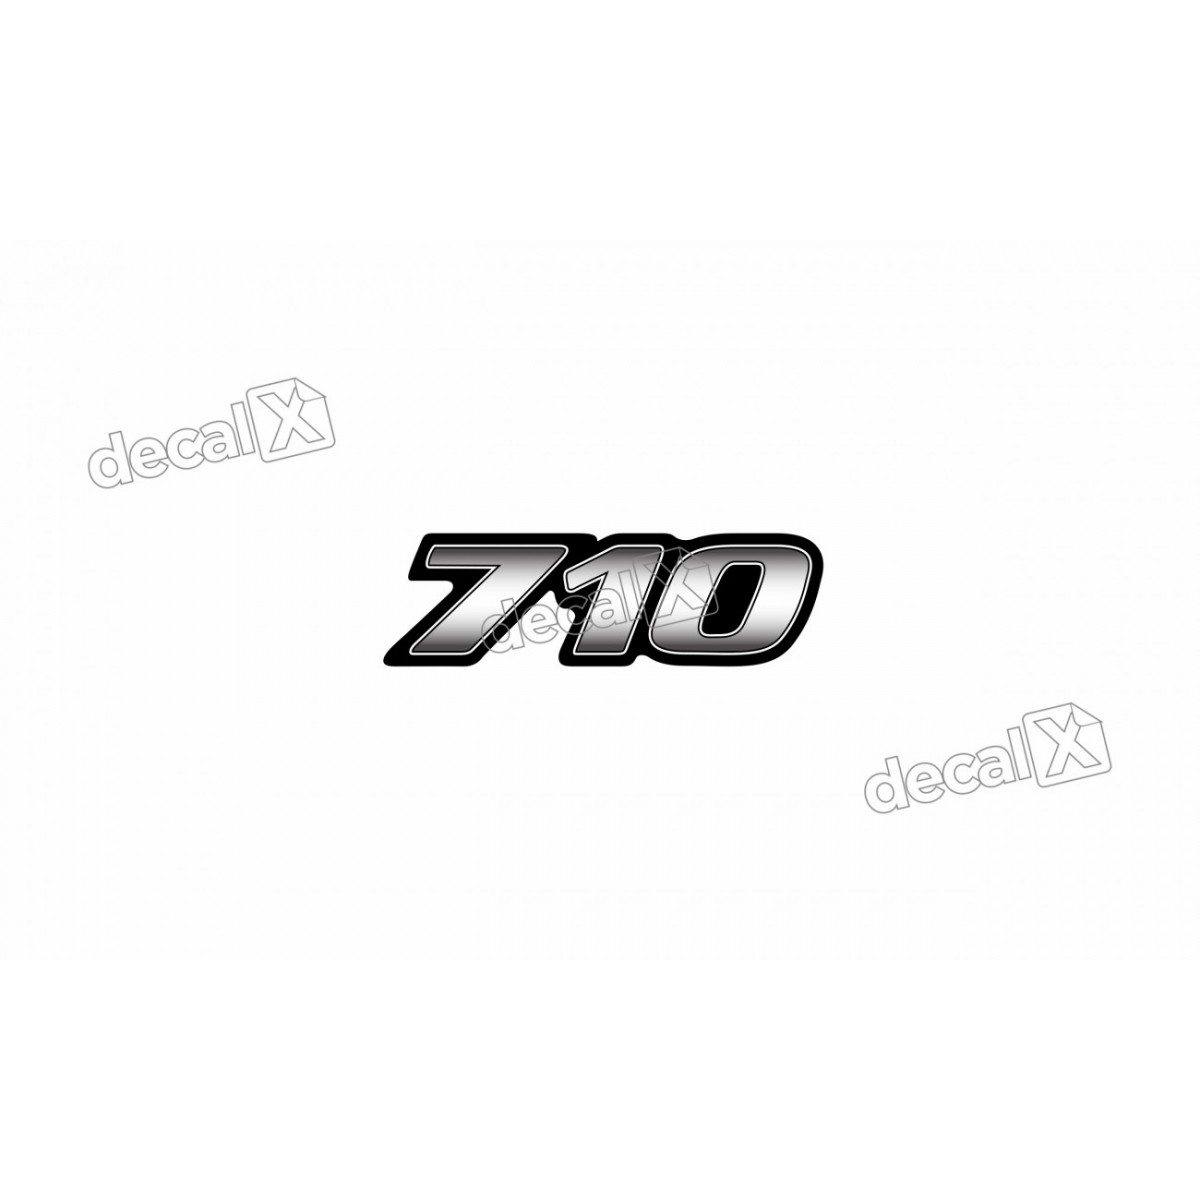 Adesivo Emblema Resinado Mercedes 710 Novo Cm6 Decalx